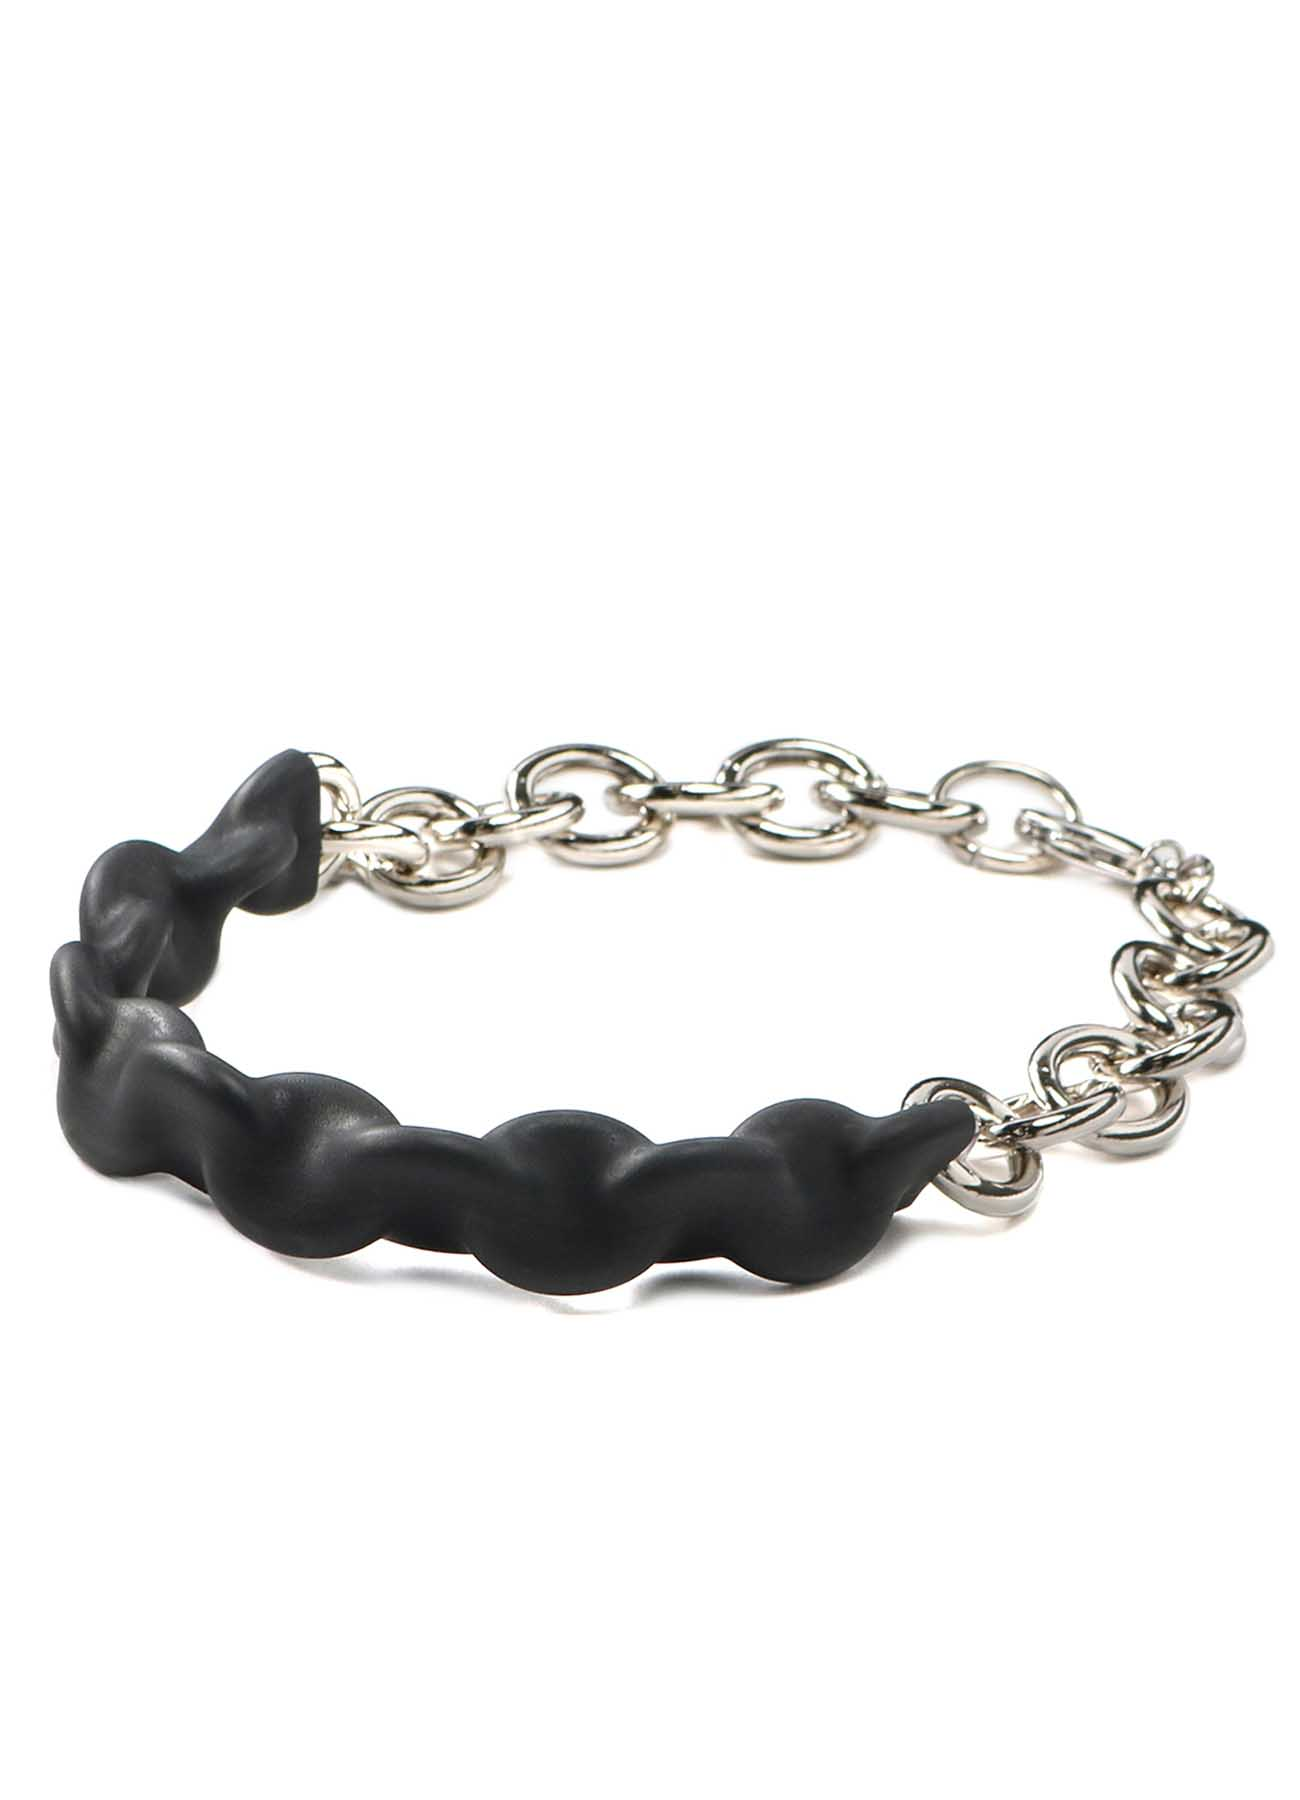 Rubber Chain Big Chain Necklace